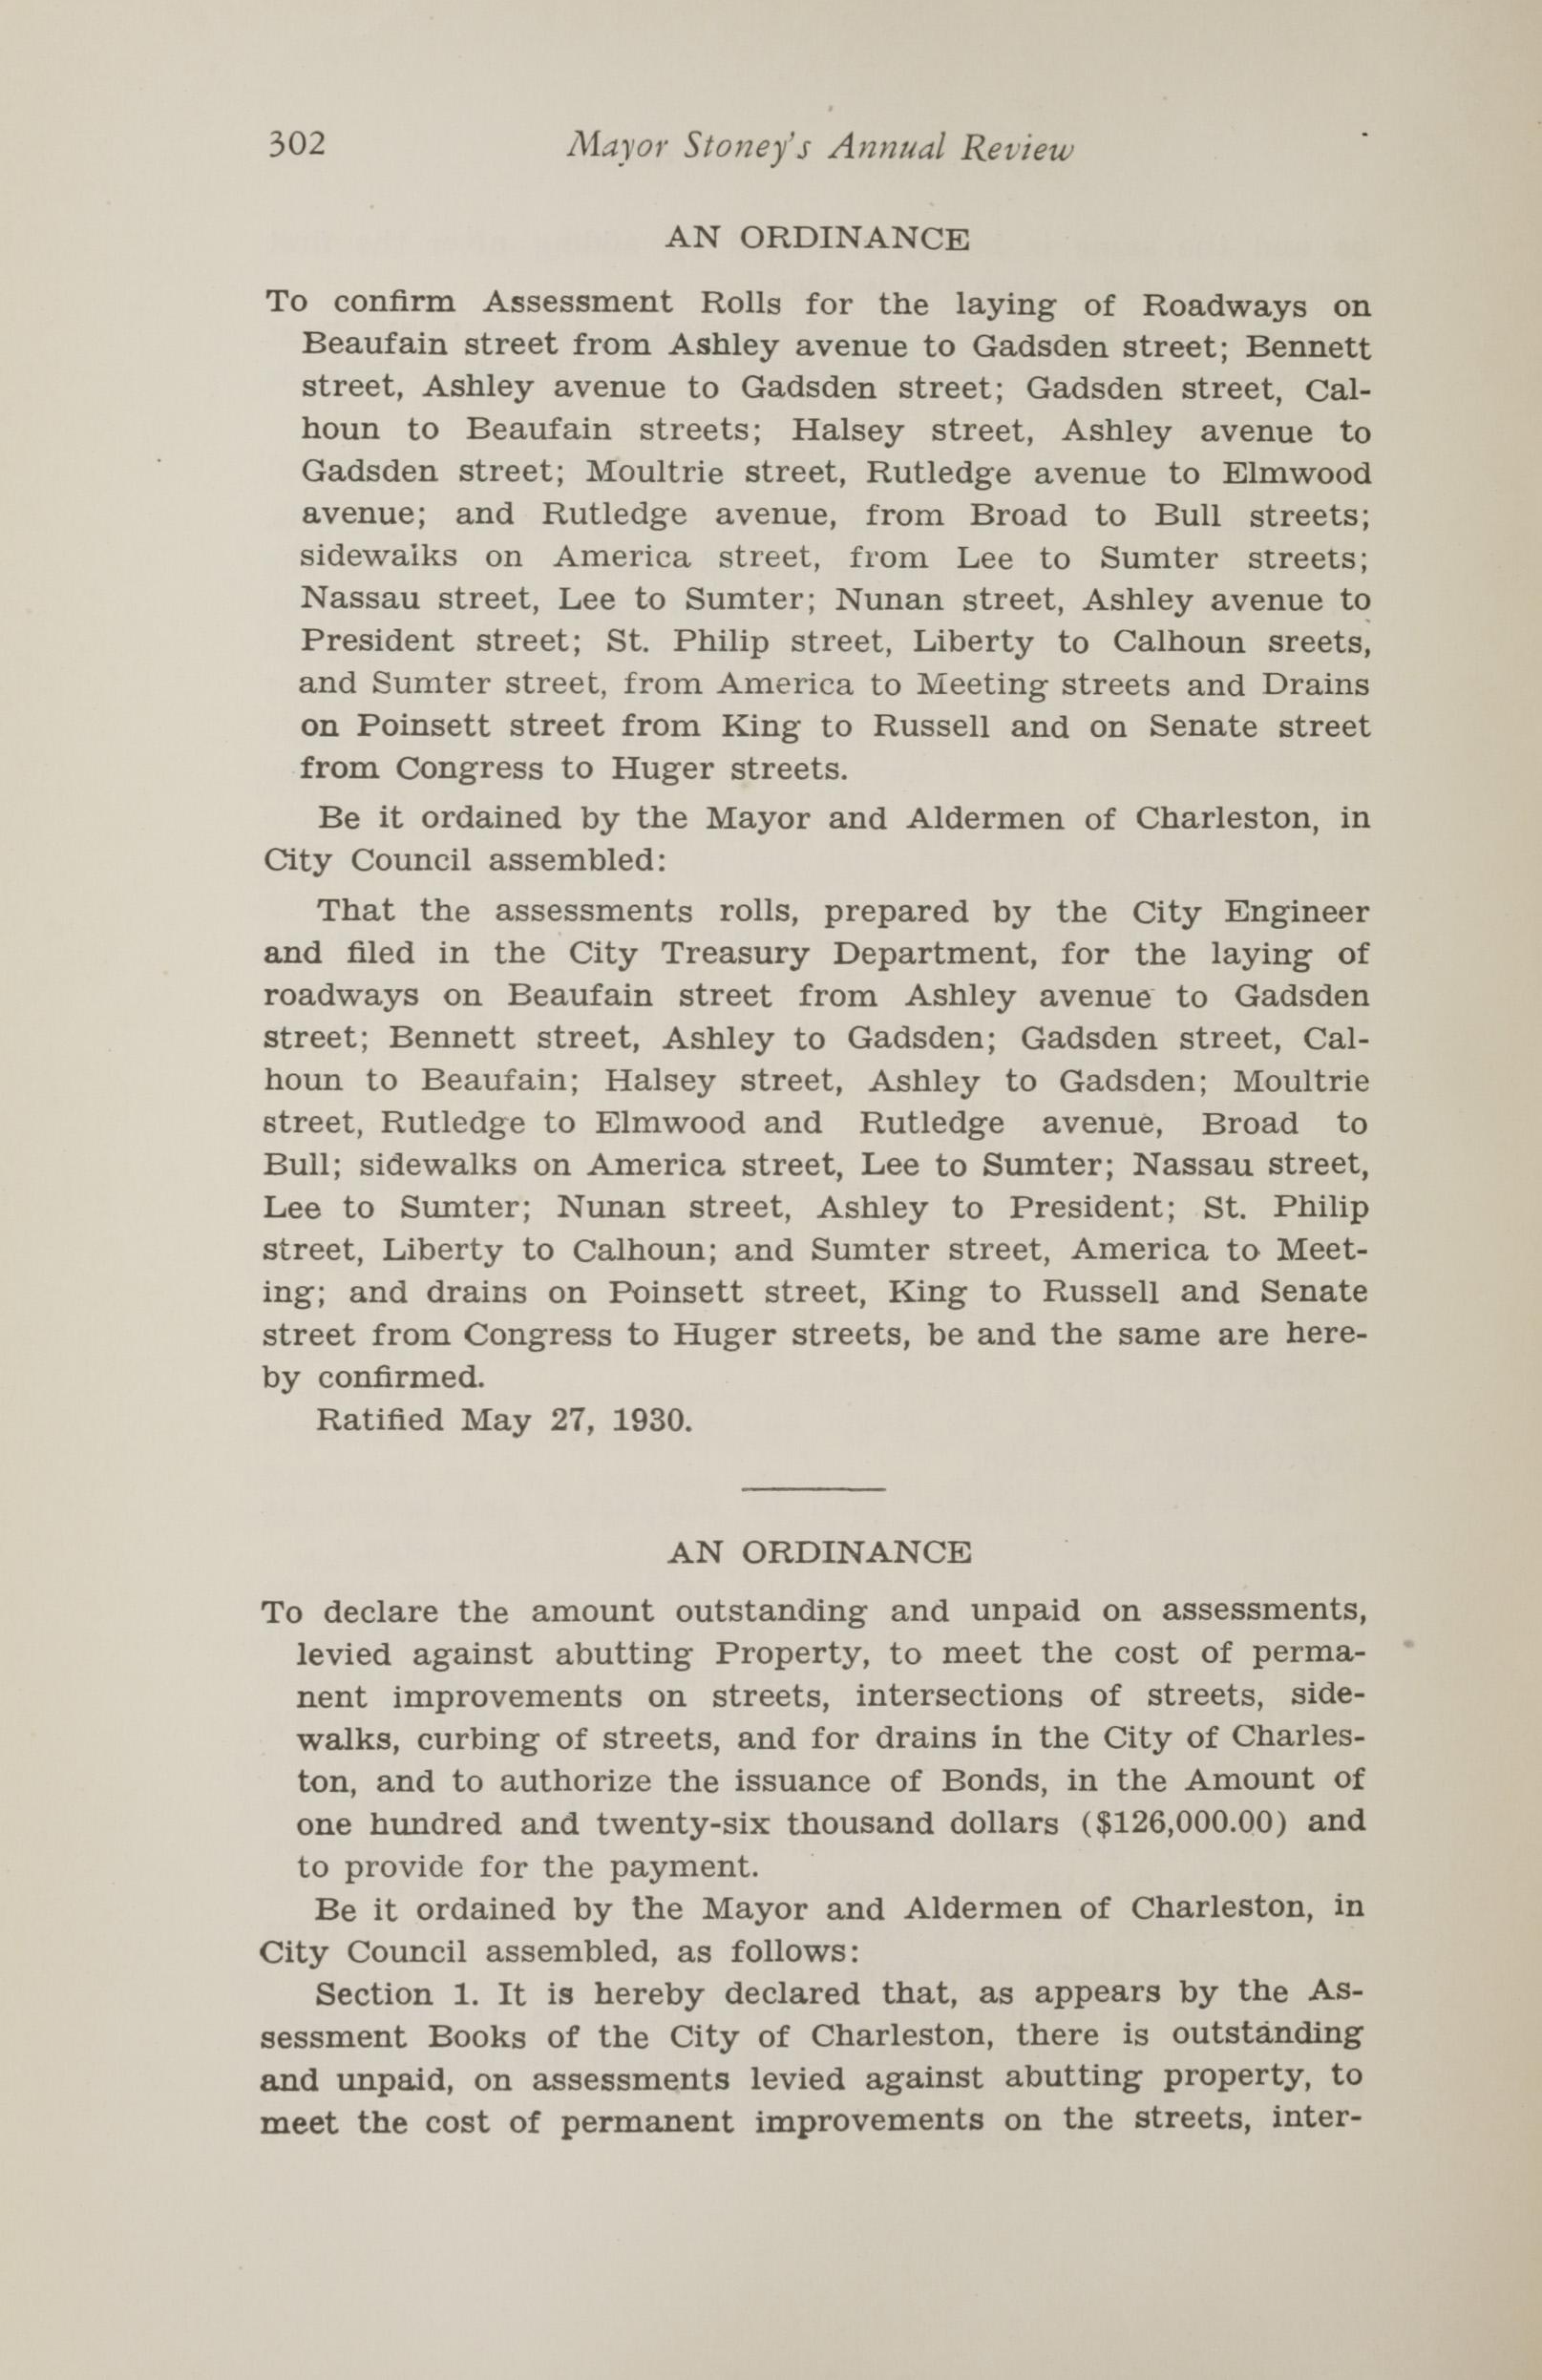 Charleston Yearbook, 1930, page 302